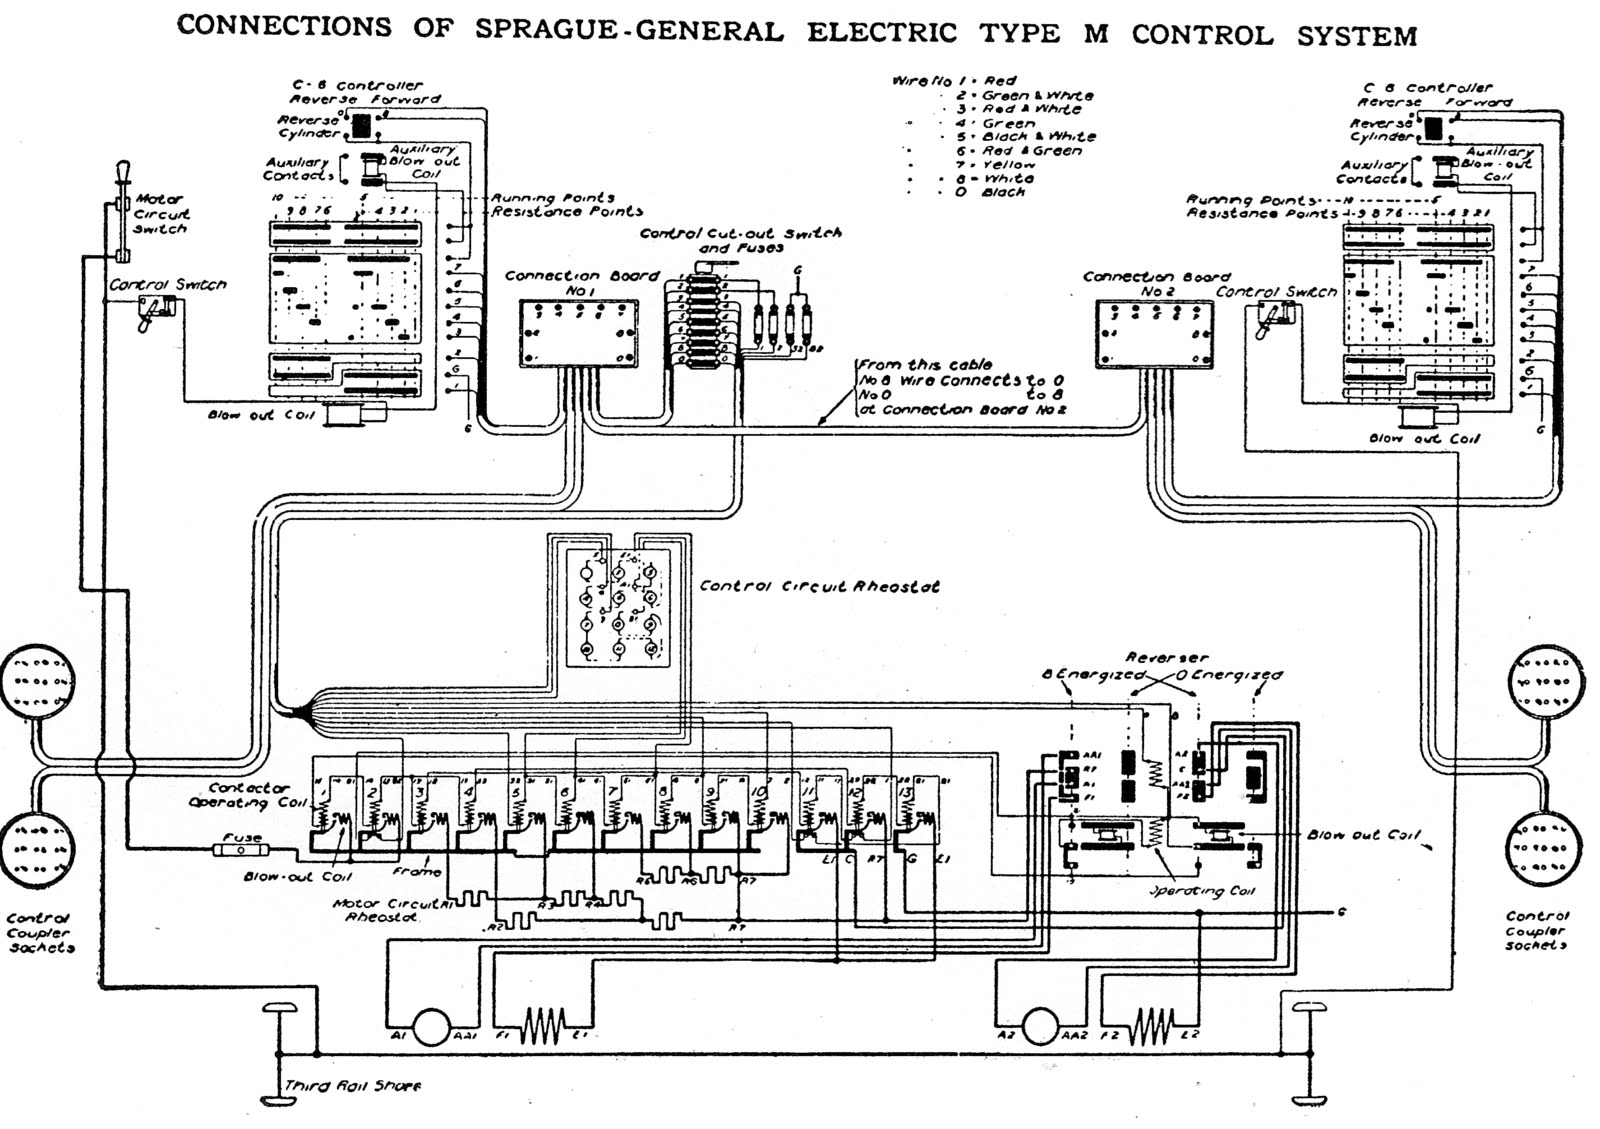 bobcat wiring harnes - wiring harness for bobcat 863 29 ... 2008 bobcat wiring diagram